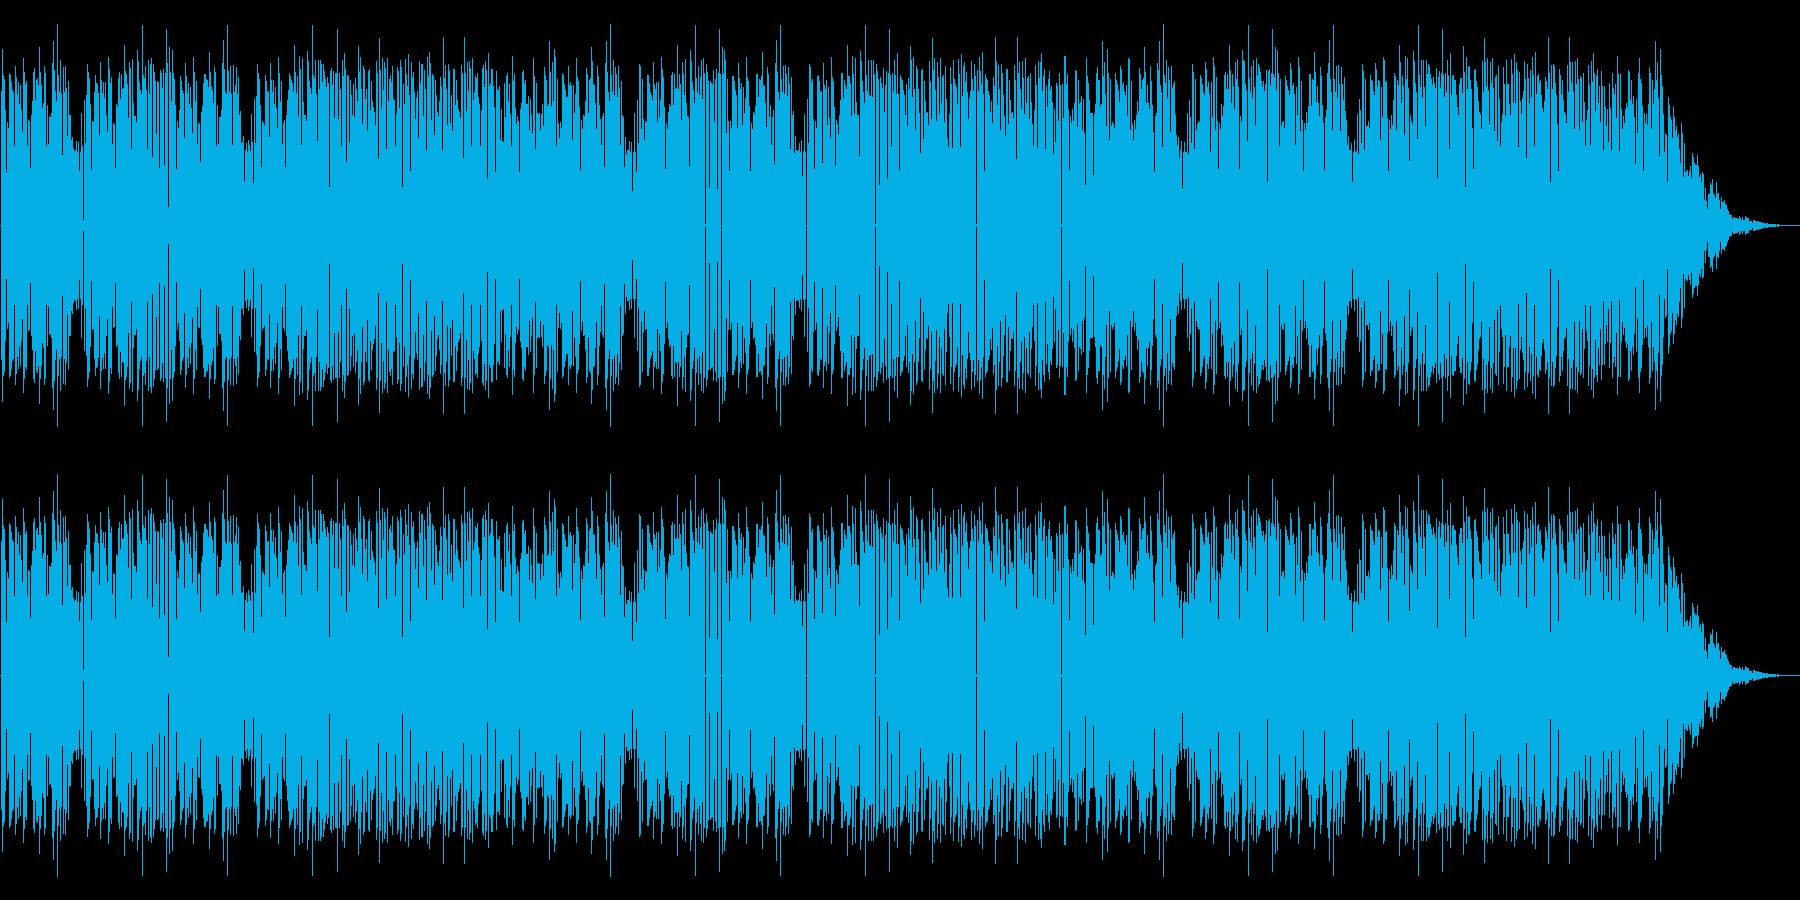 NES レース A02-1(ステージ1)の再生済みの波形